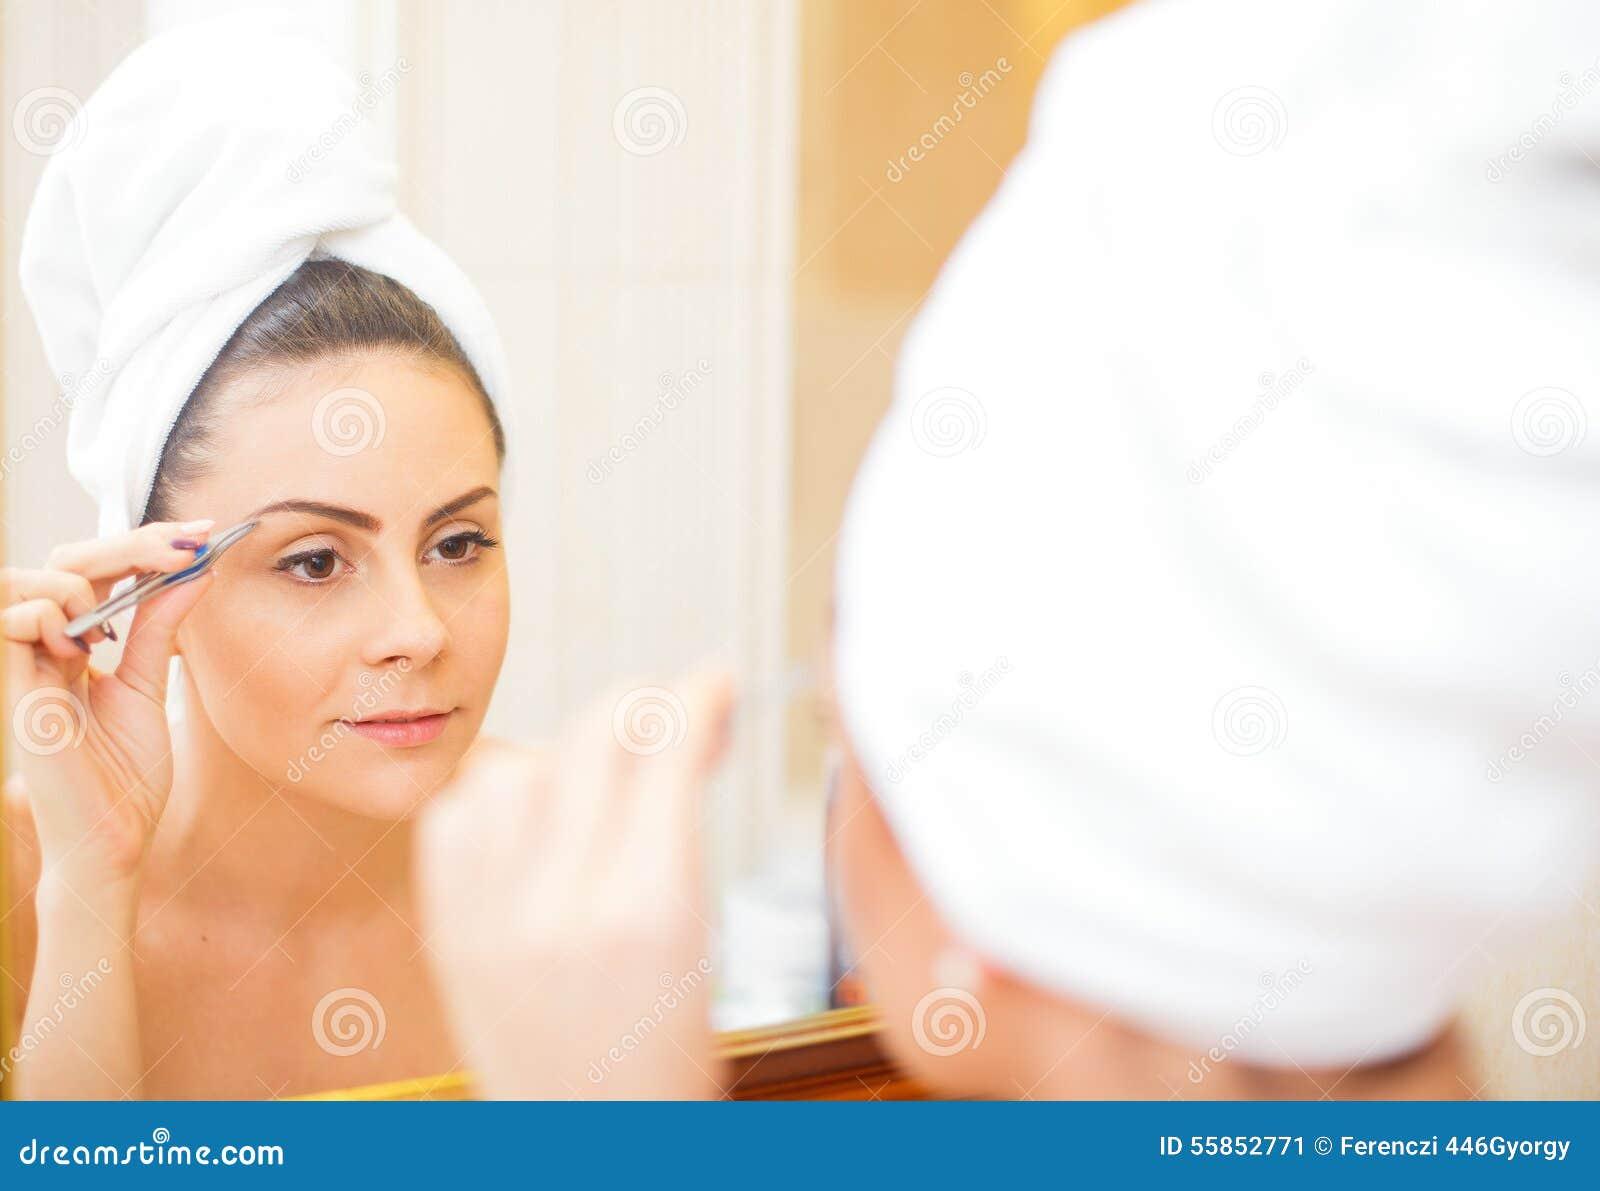 Picking Eyebrows Stock Image Image Of Body Take Eyebrow 55852771